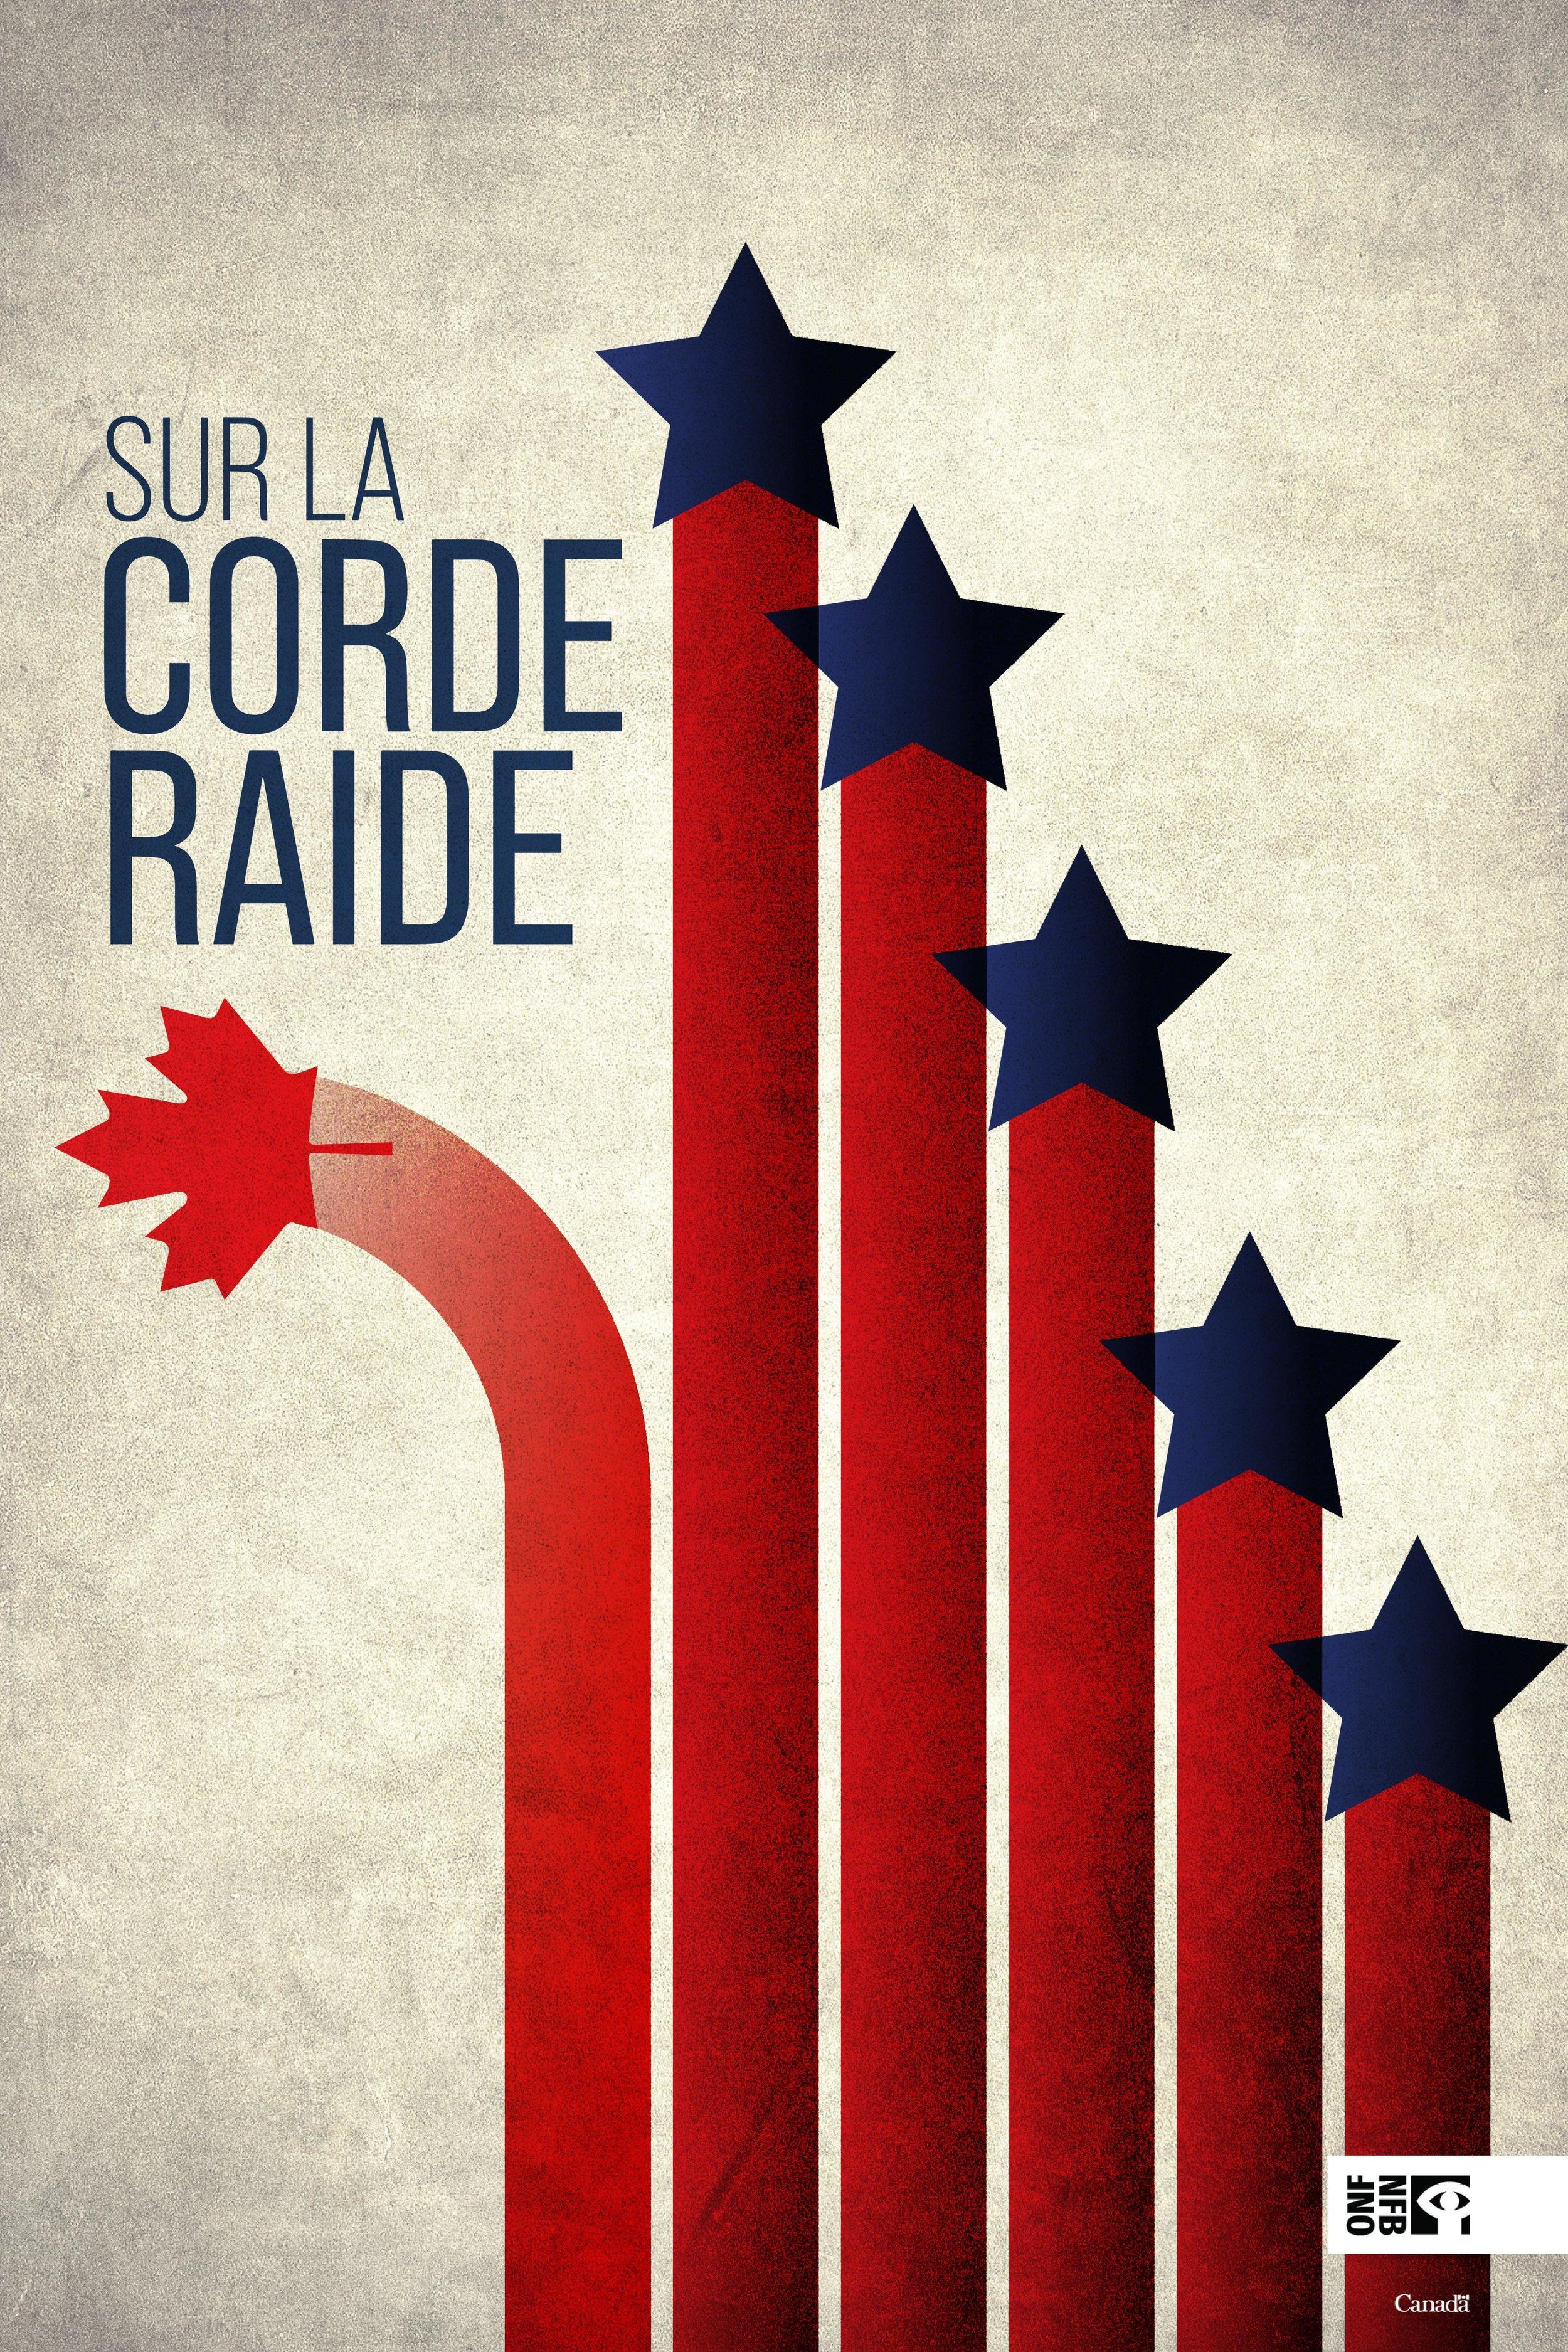 SURLACORDERAIDE-LaCamaraderie-Poster-1mars-01 (1)_00001.jpg